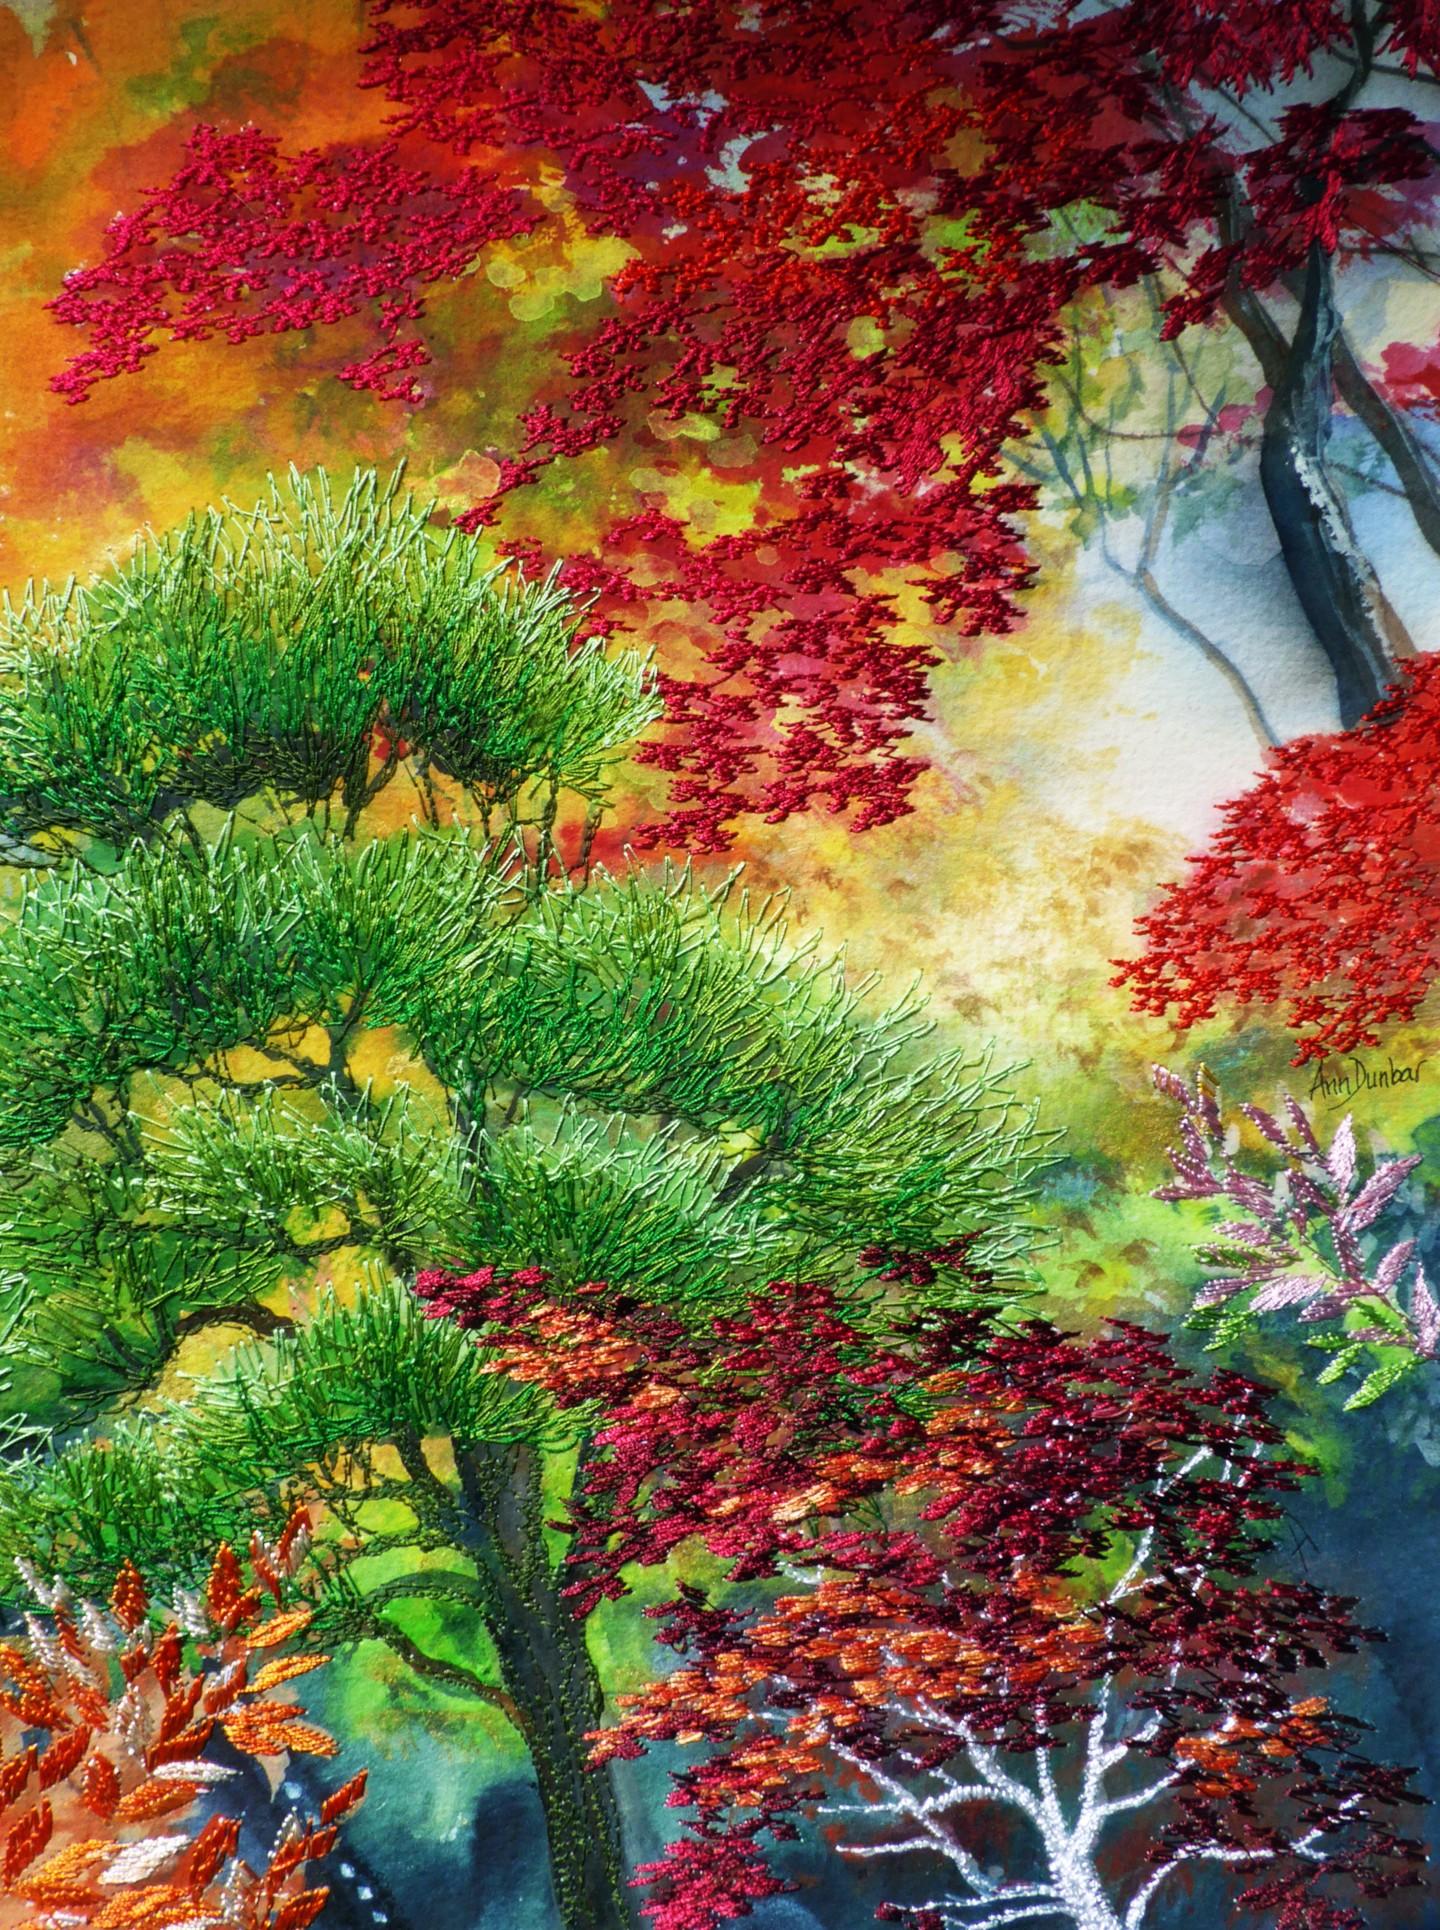 Ann Dunbar - Peak of Autumn